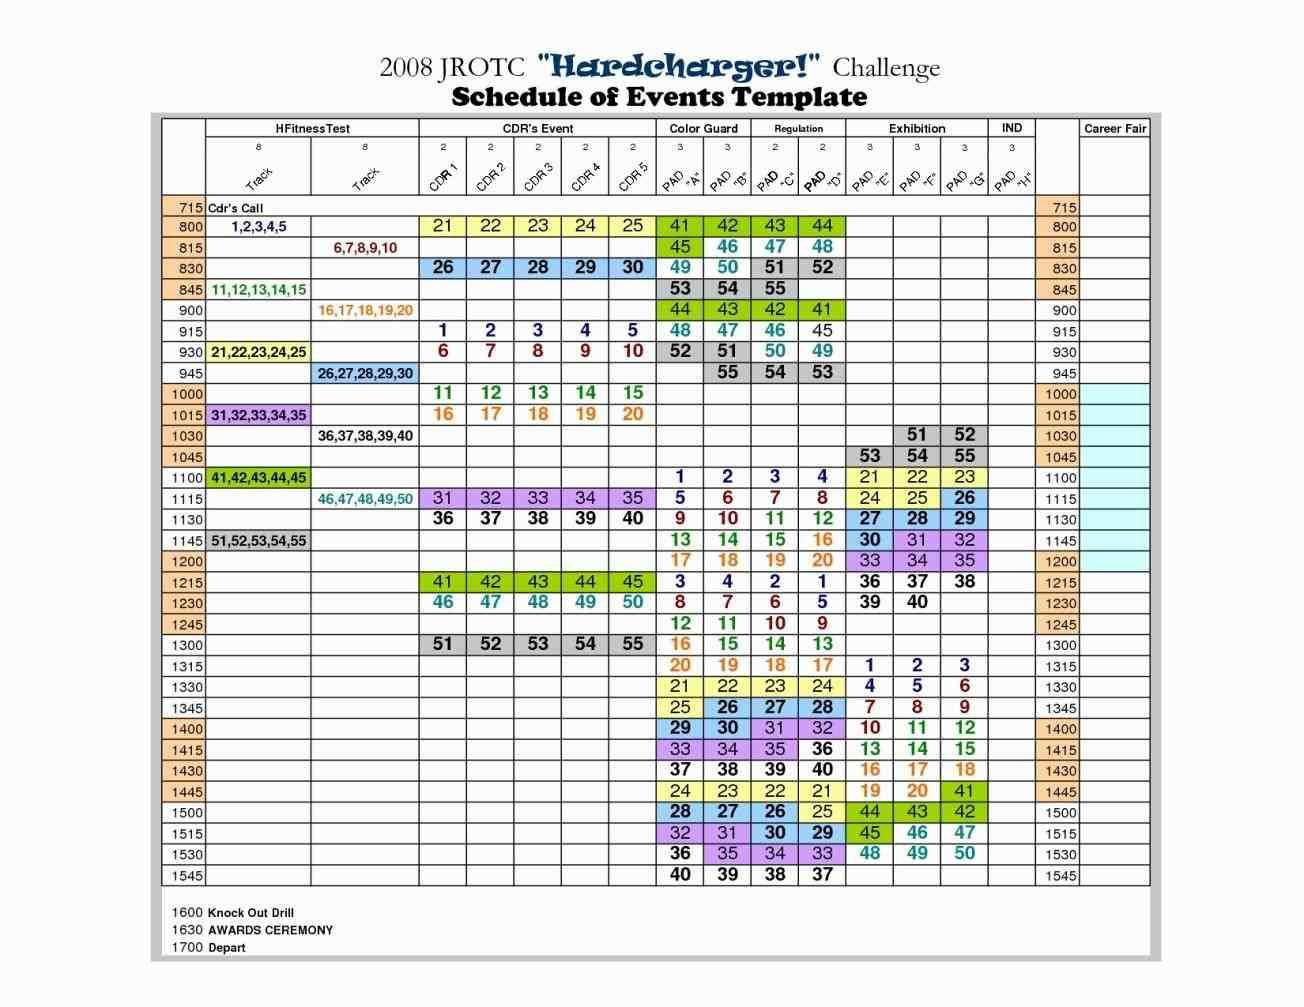 image templates rhalramiinfo gantt Free Download Gantt Chart Template For Excel chart template excel free download choice image templates rhalramiinfo simple